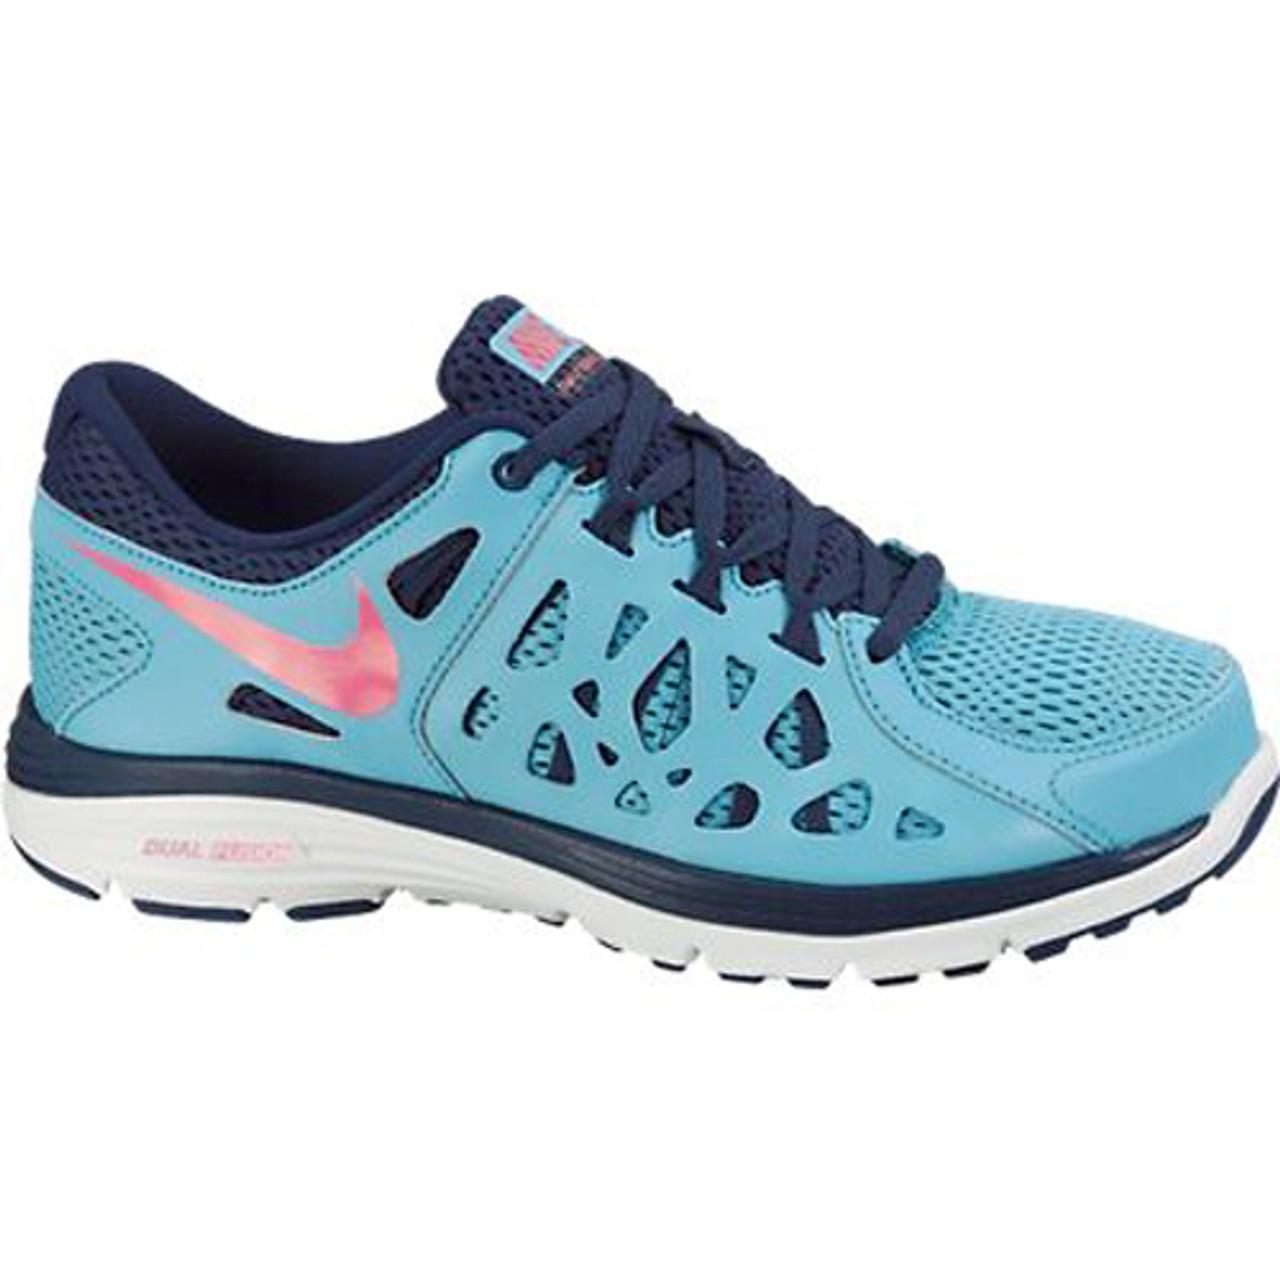 regard détaillé 6ef38 ed8dc Nike Dual Fusion Run 2 Blue/Pink Ladies Running Shoes